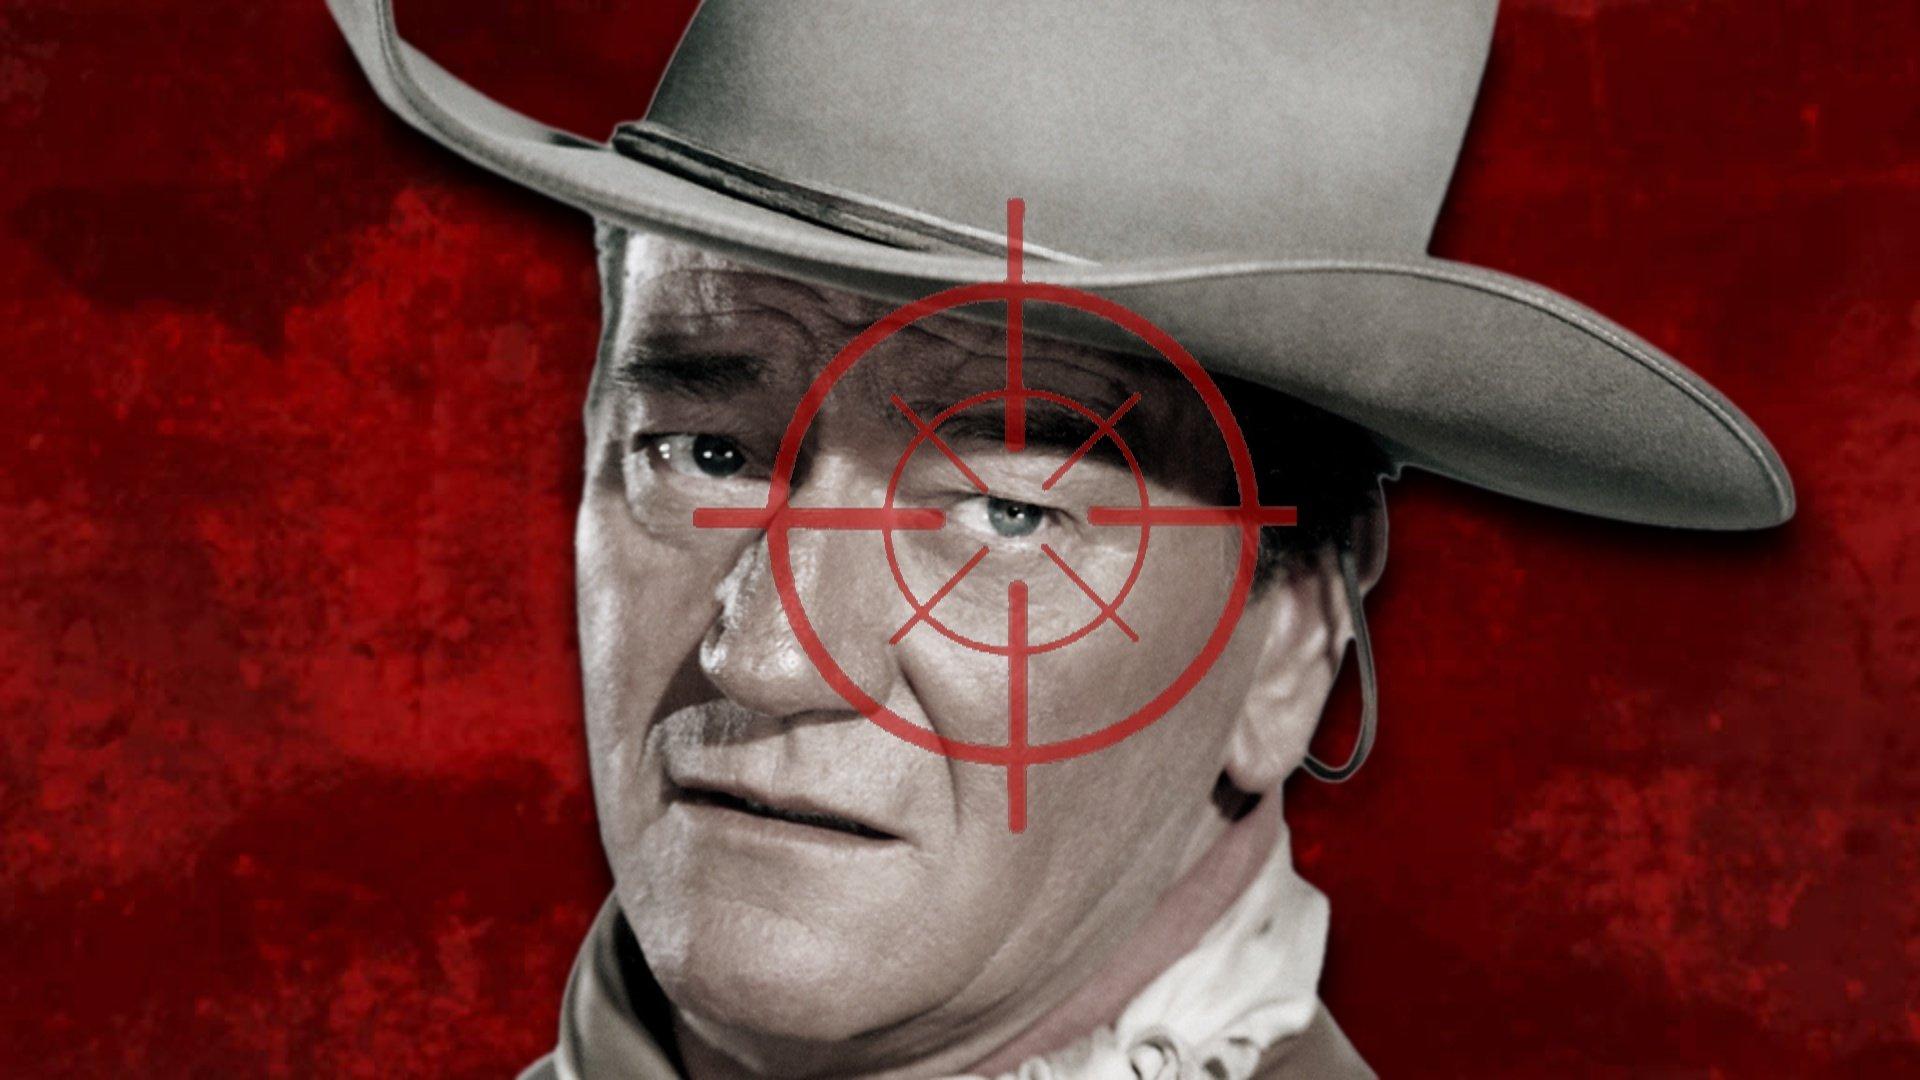 John Wayne's FBI File Says Nothing About Stalin Assassination Plot